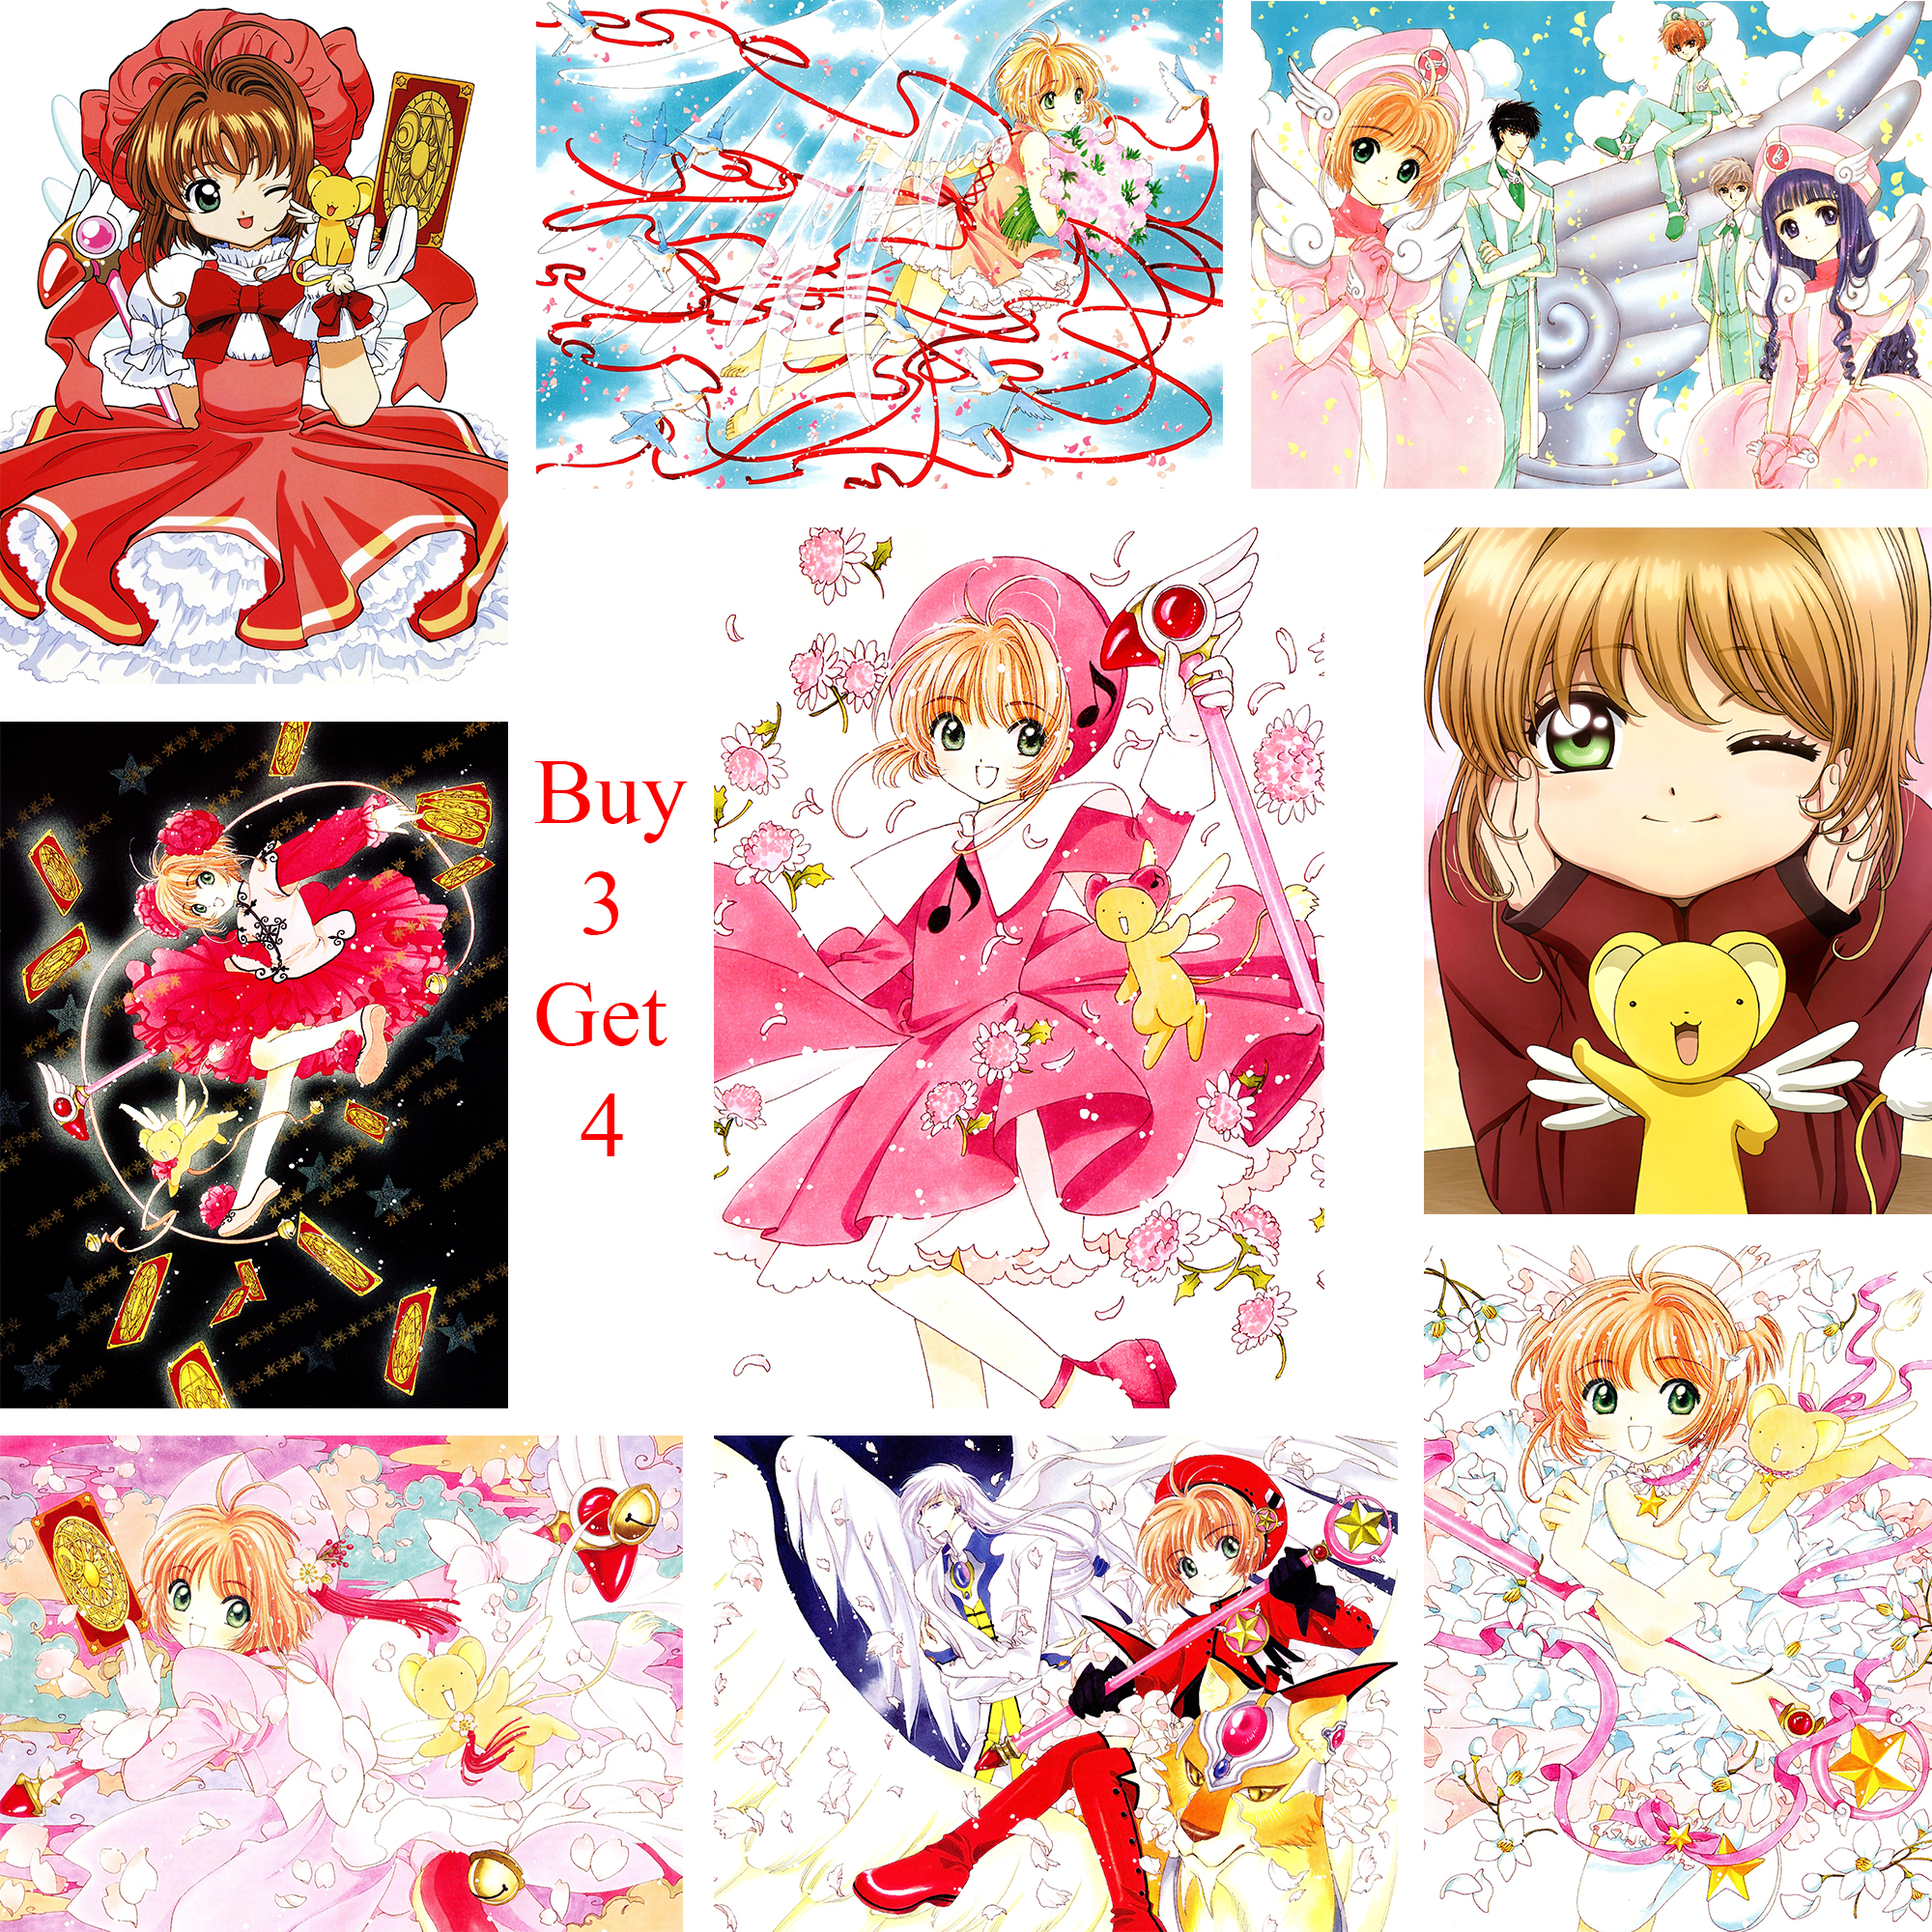 Card Captor Sakura Posters Cartoon Wall Stickers White Coated